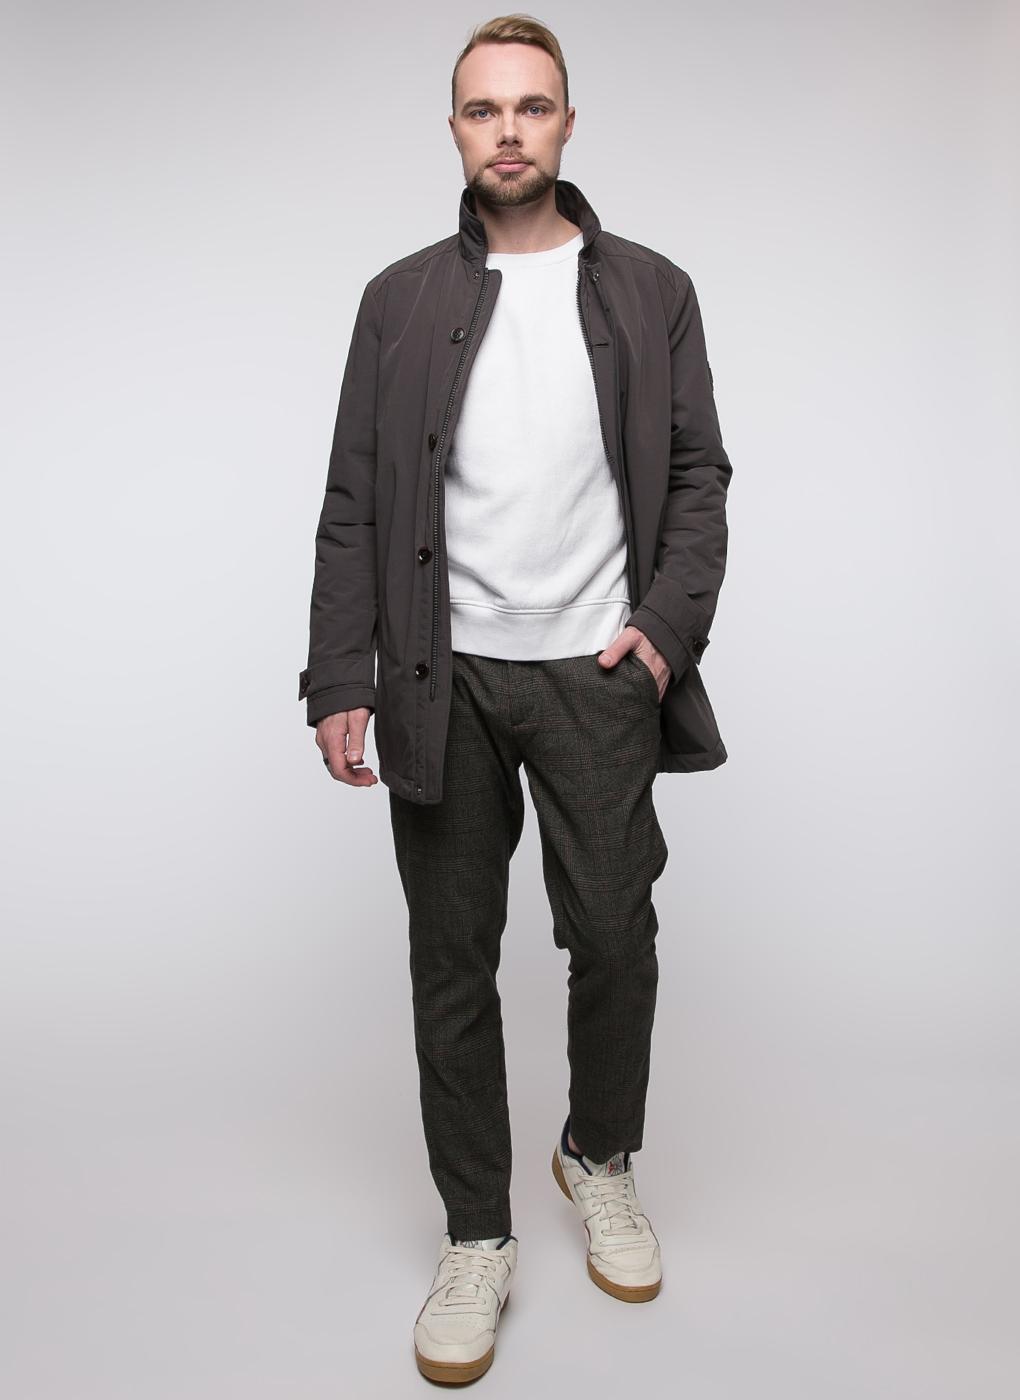 Куртка мужская утепленная 09, Snowimage фото